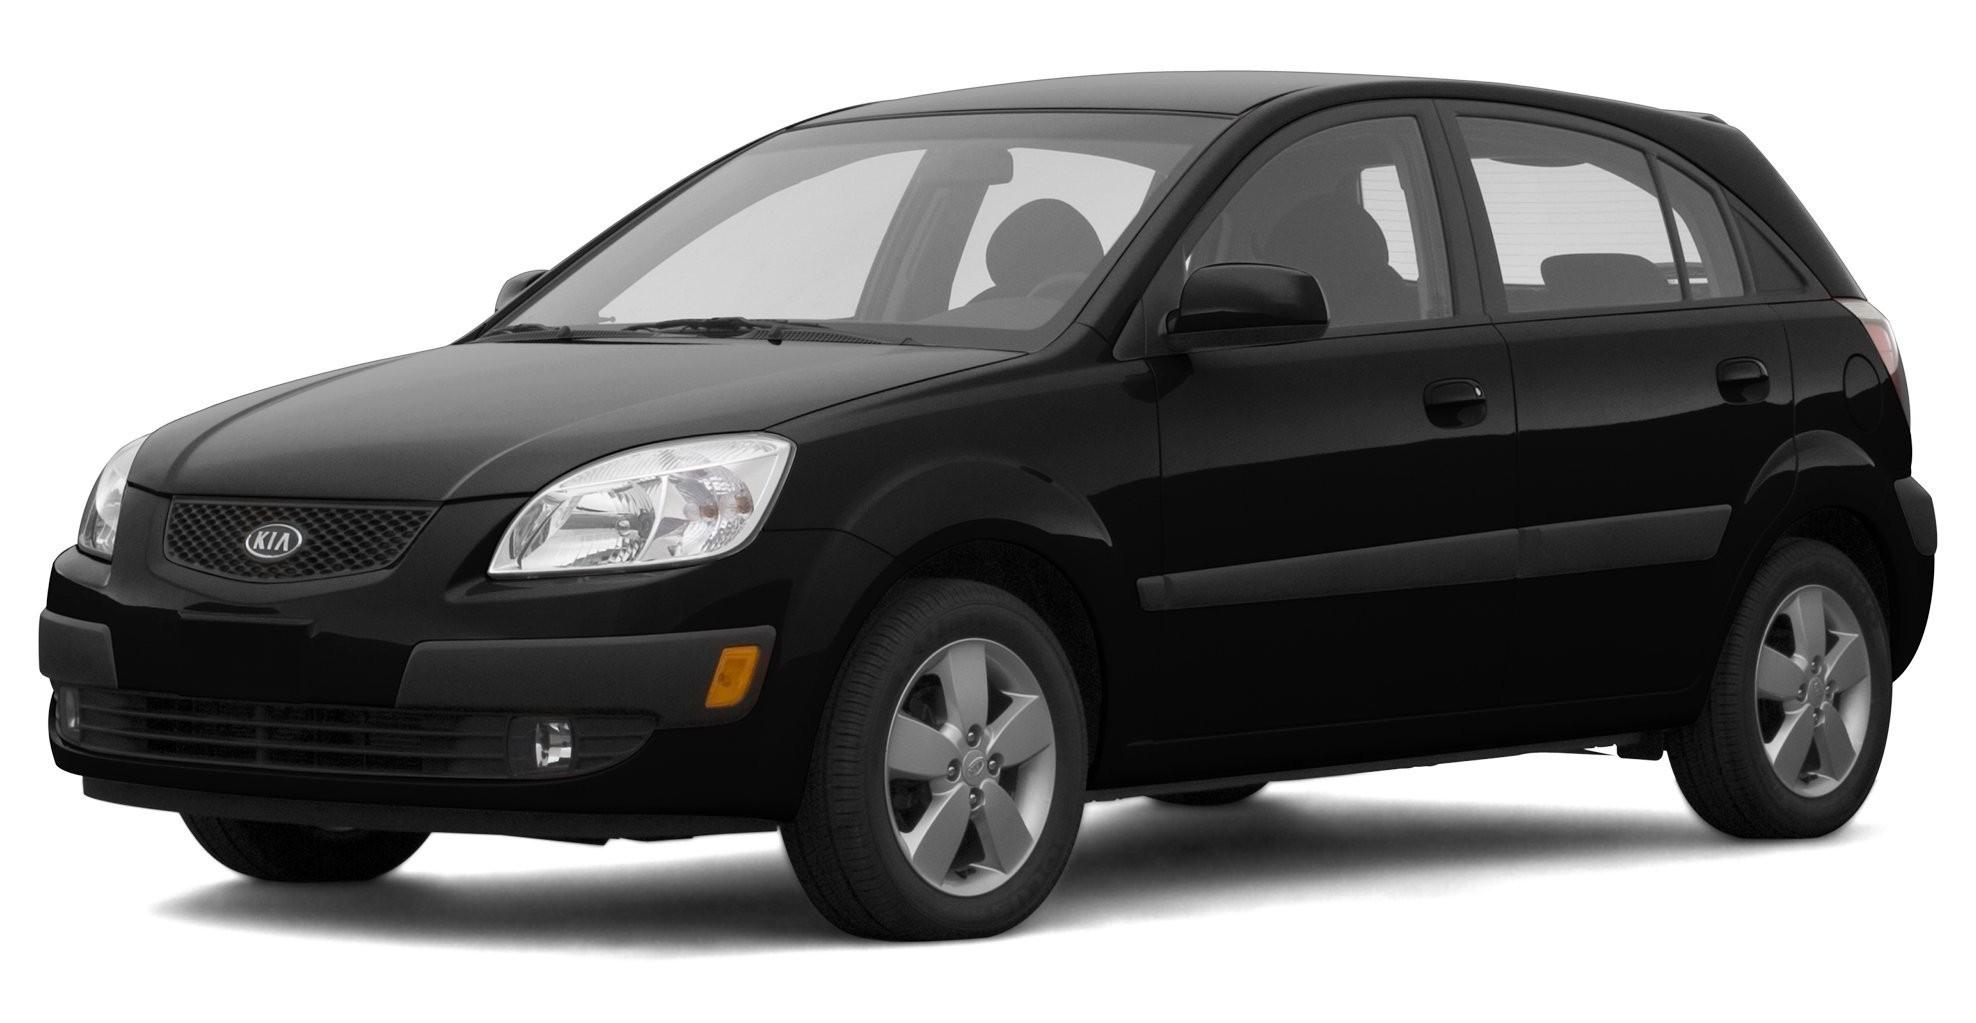 2007 Kia Rio SX 5 Door Hatchback Manual Transmission Rio5